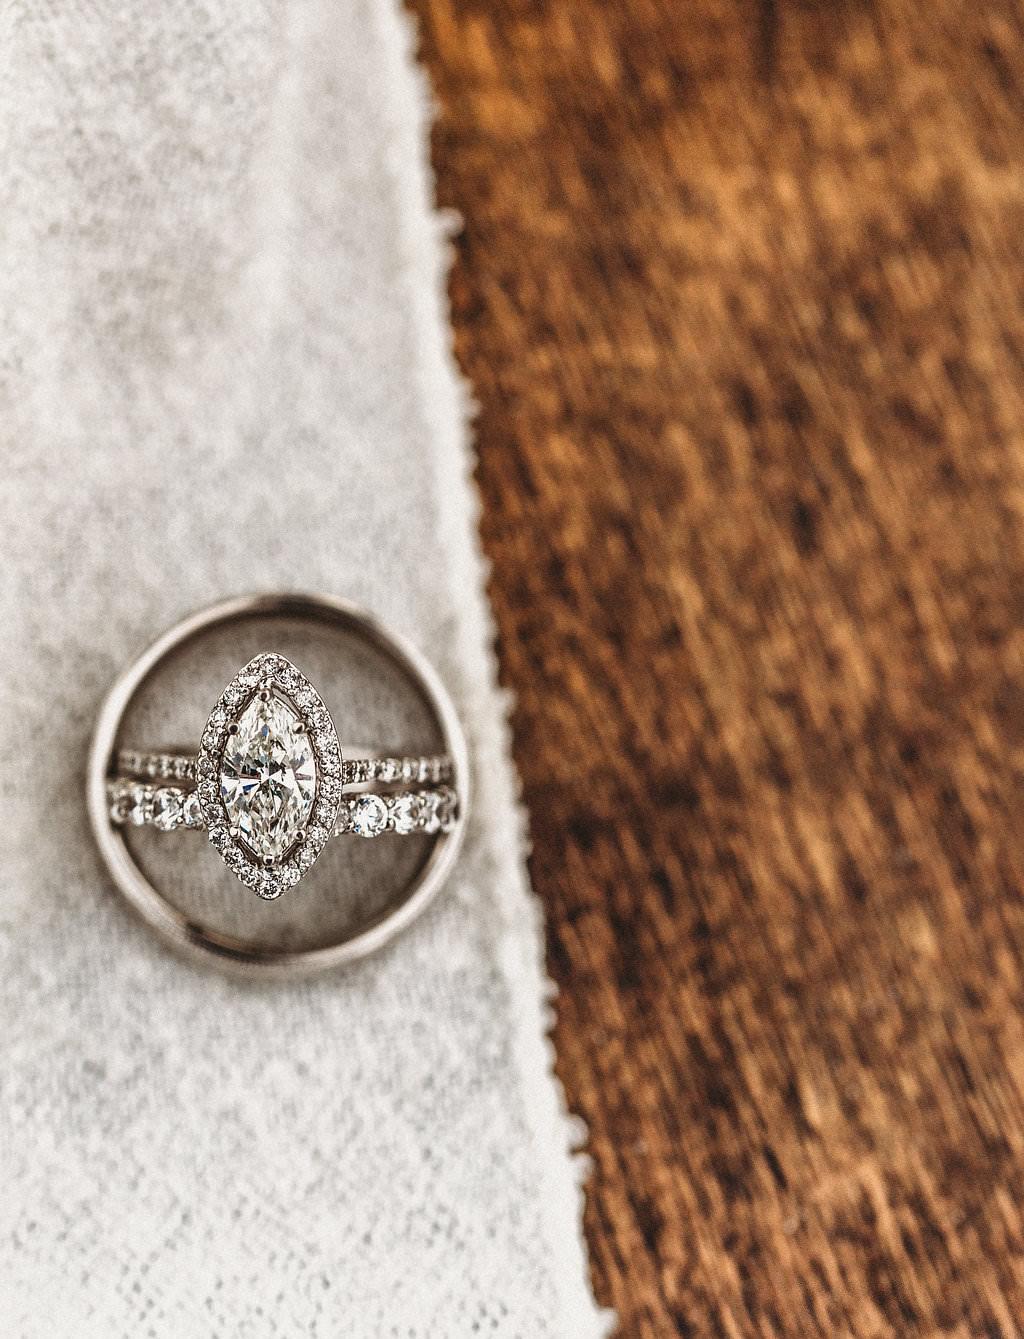 Diamond Wedding Ring, Marquise Cut Halo Diamond Engagement Ring in Men's Wedding Band